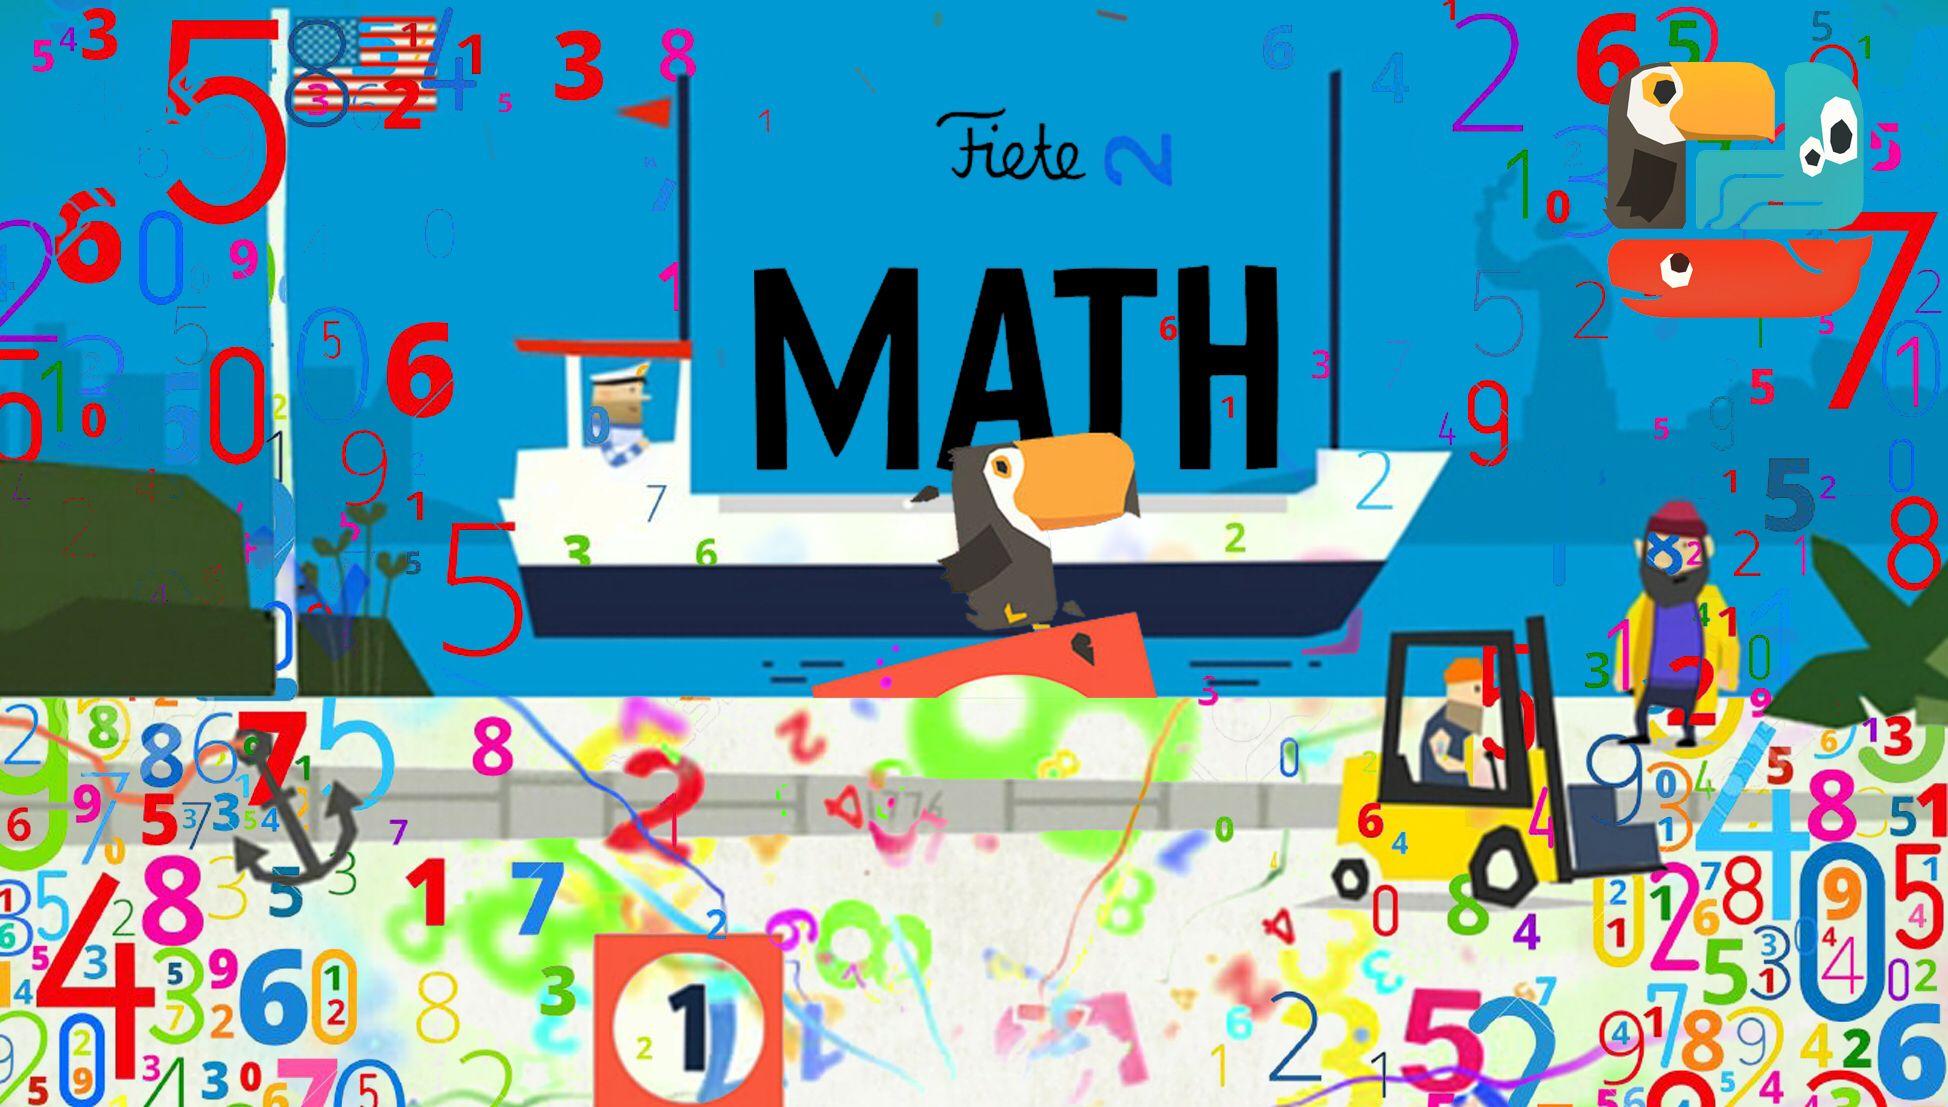 Brilliant kids game that teaches math! | Mobile kids games | Pinterest